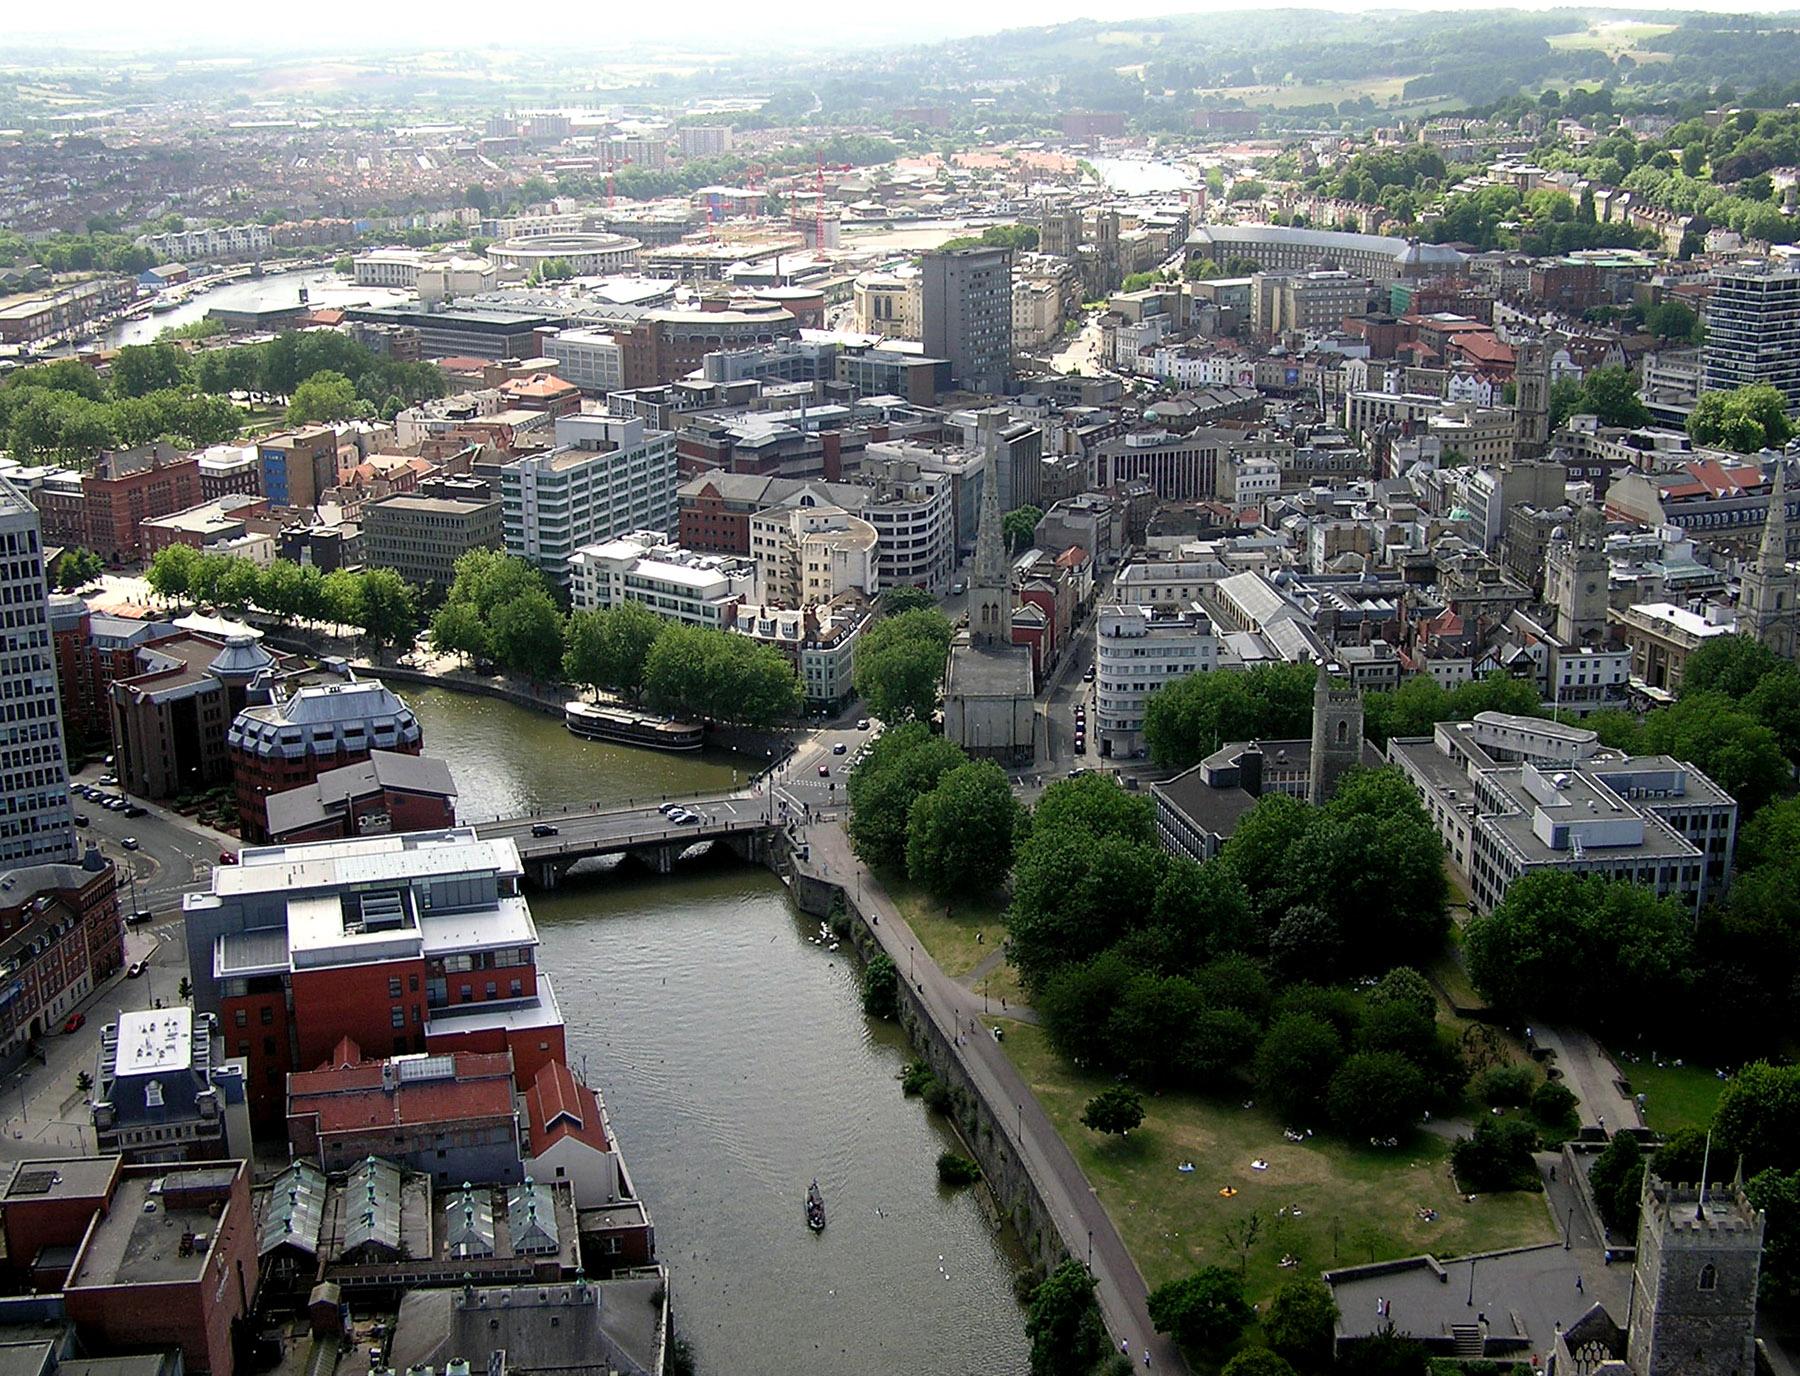 File:River.avon.from.balloon.bristol.arp.jpg - Wikimedia Commons